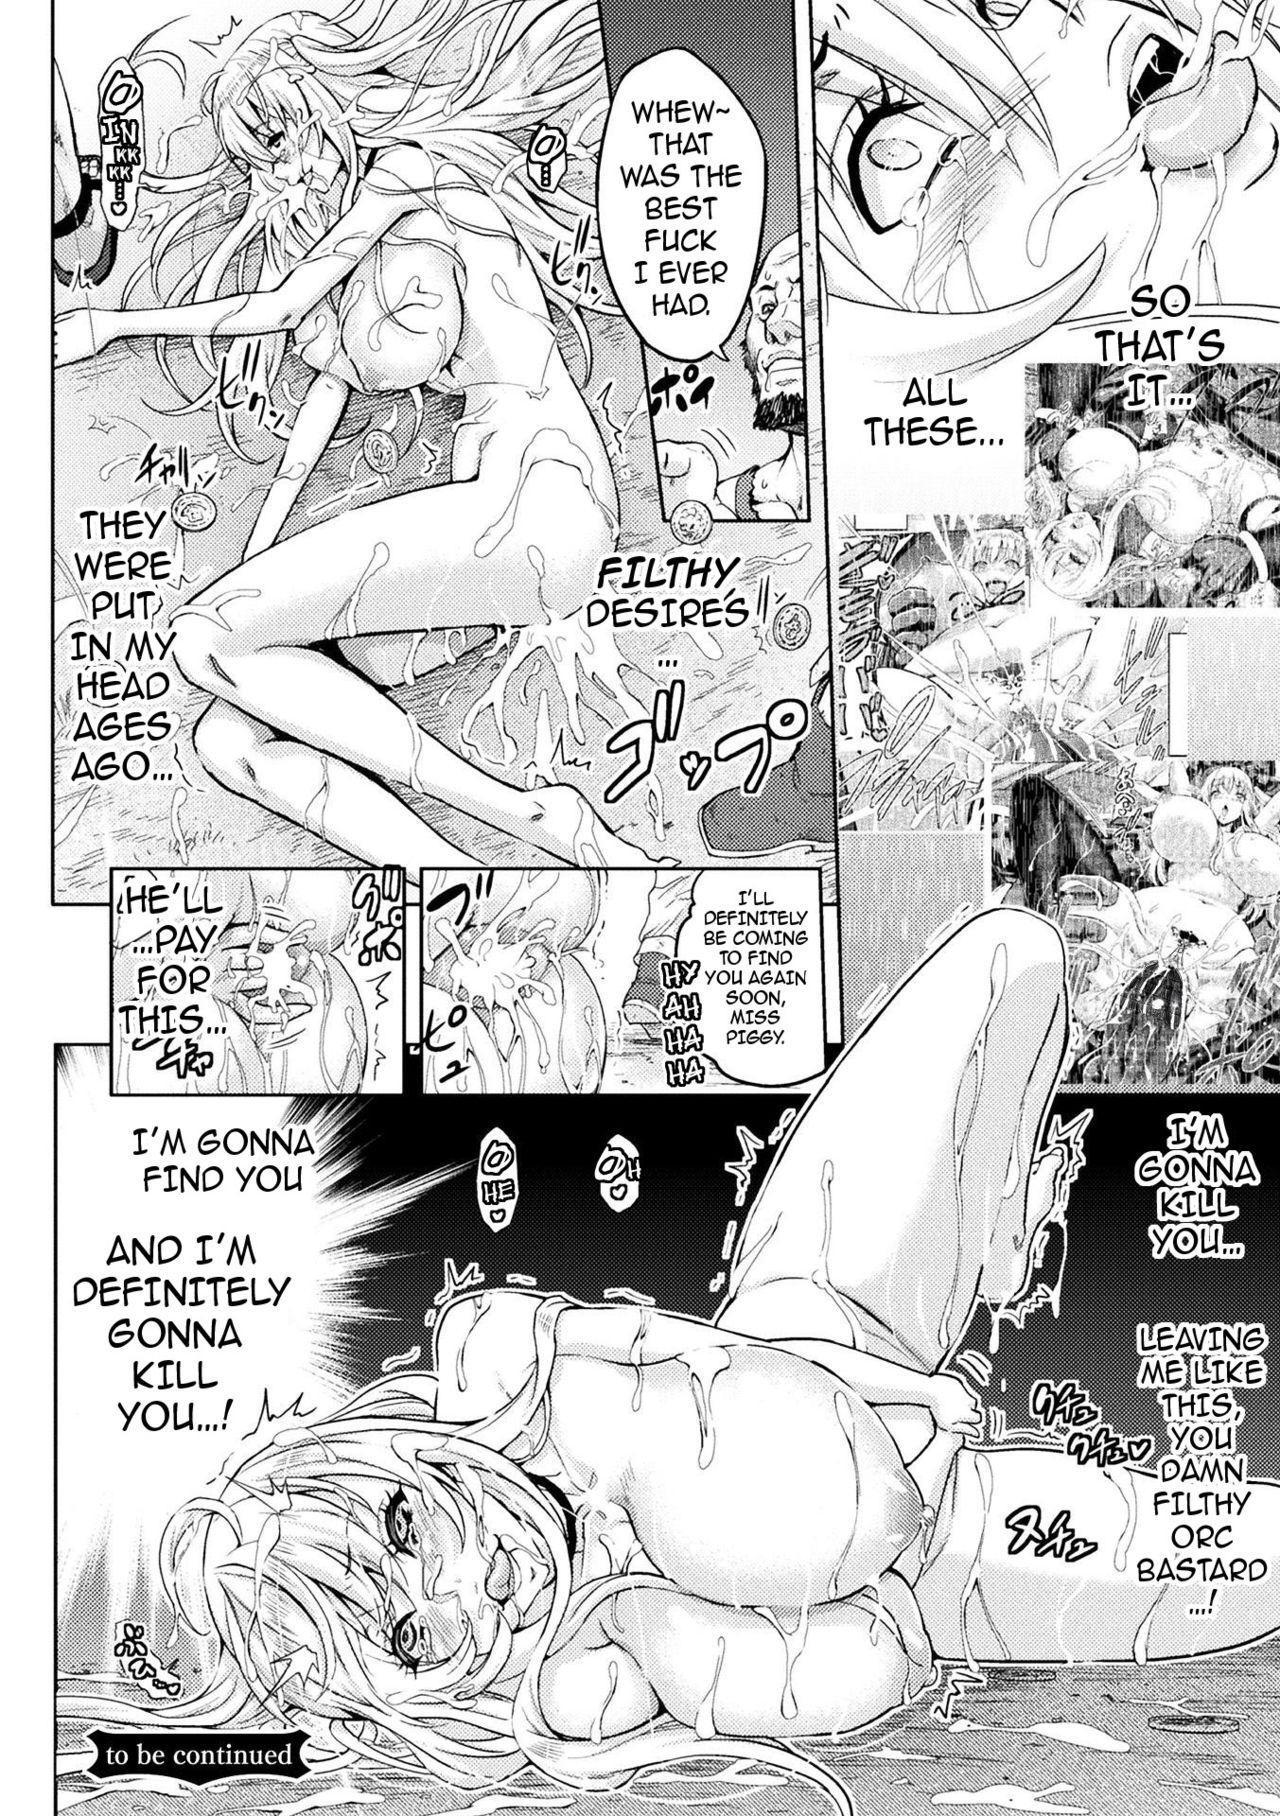 [Yamada Gogogo] Erona ~Orc no Inmon ni Okasareta Onna Kishi no Matsuro~ | Erona ~The Fall of a Beautiful Knight Cursed with the Lewd Mark of an Orc~ Ch. 1-6 [English] [darknight] [Decensored] [ongoing] 151